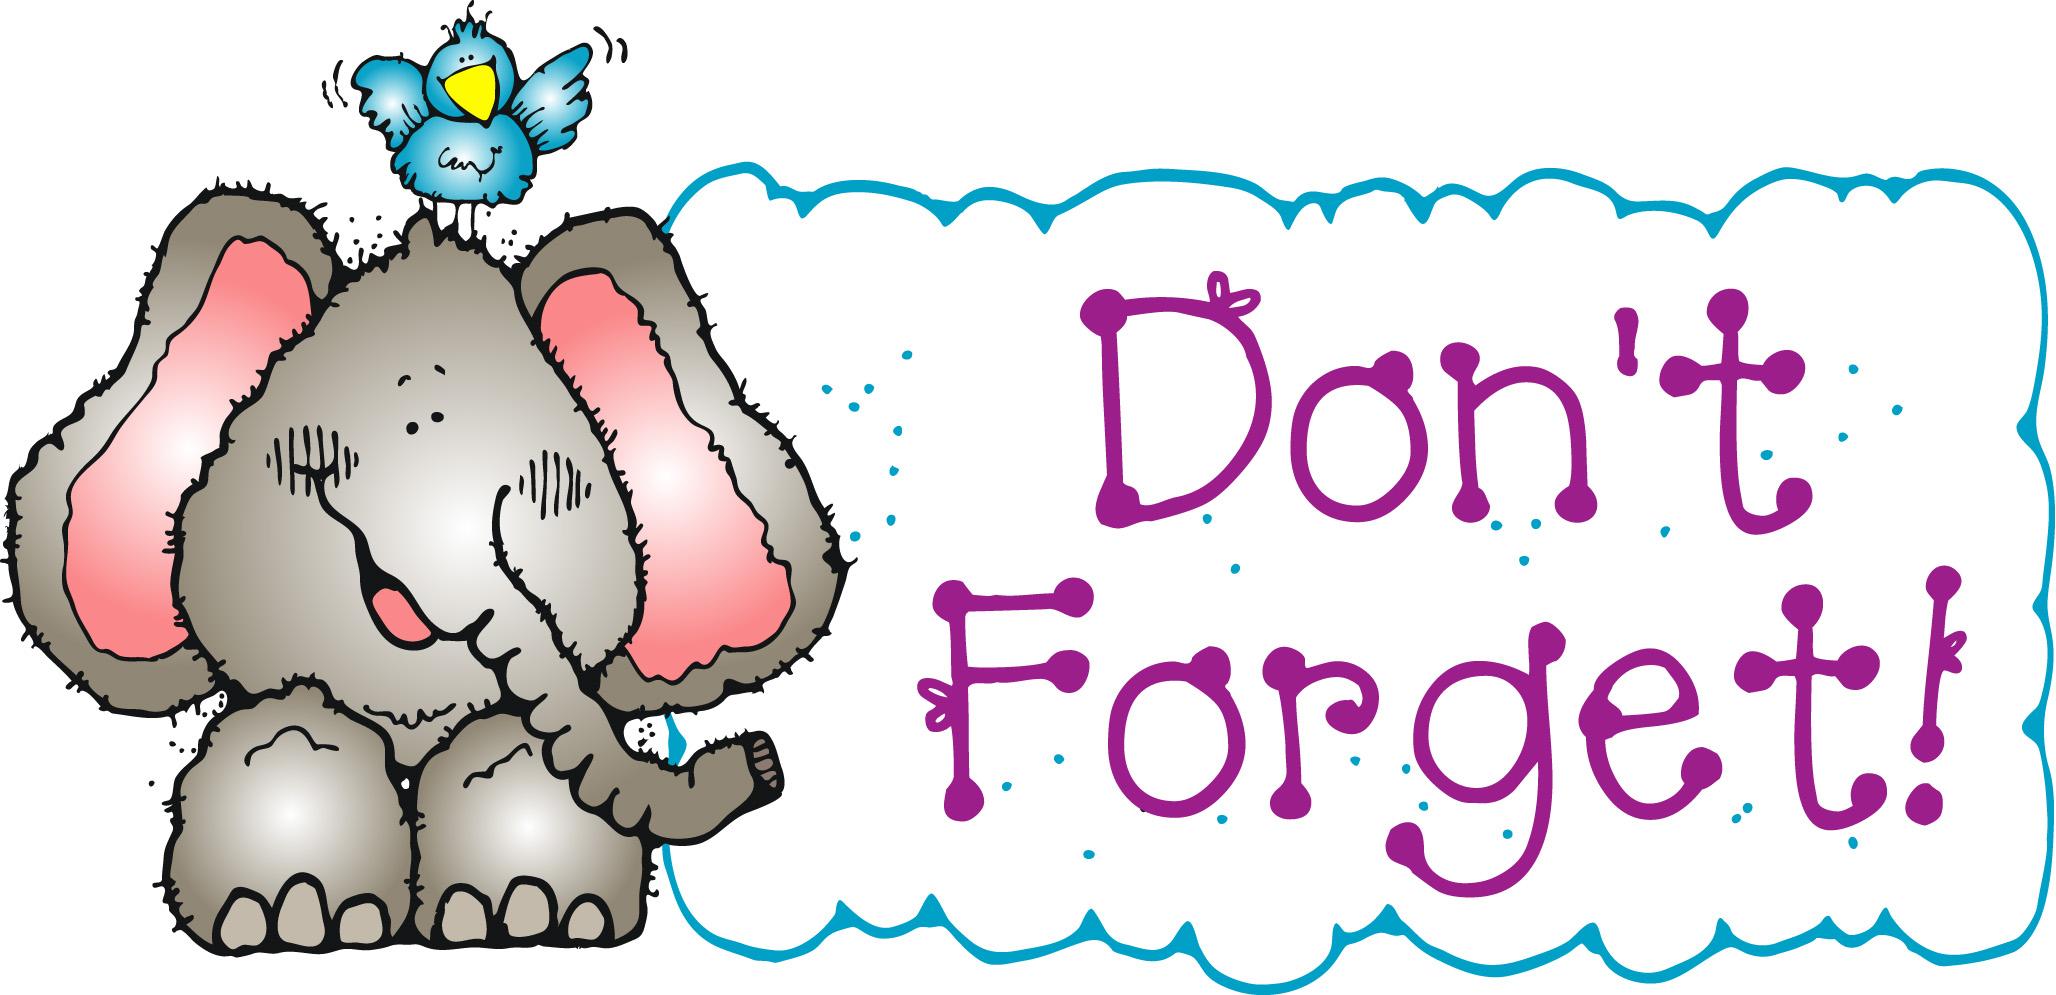 Reminder clip art images free clipart images 2